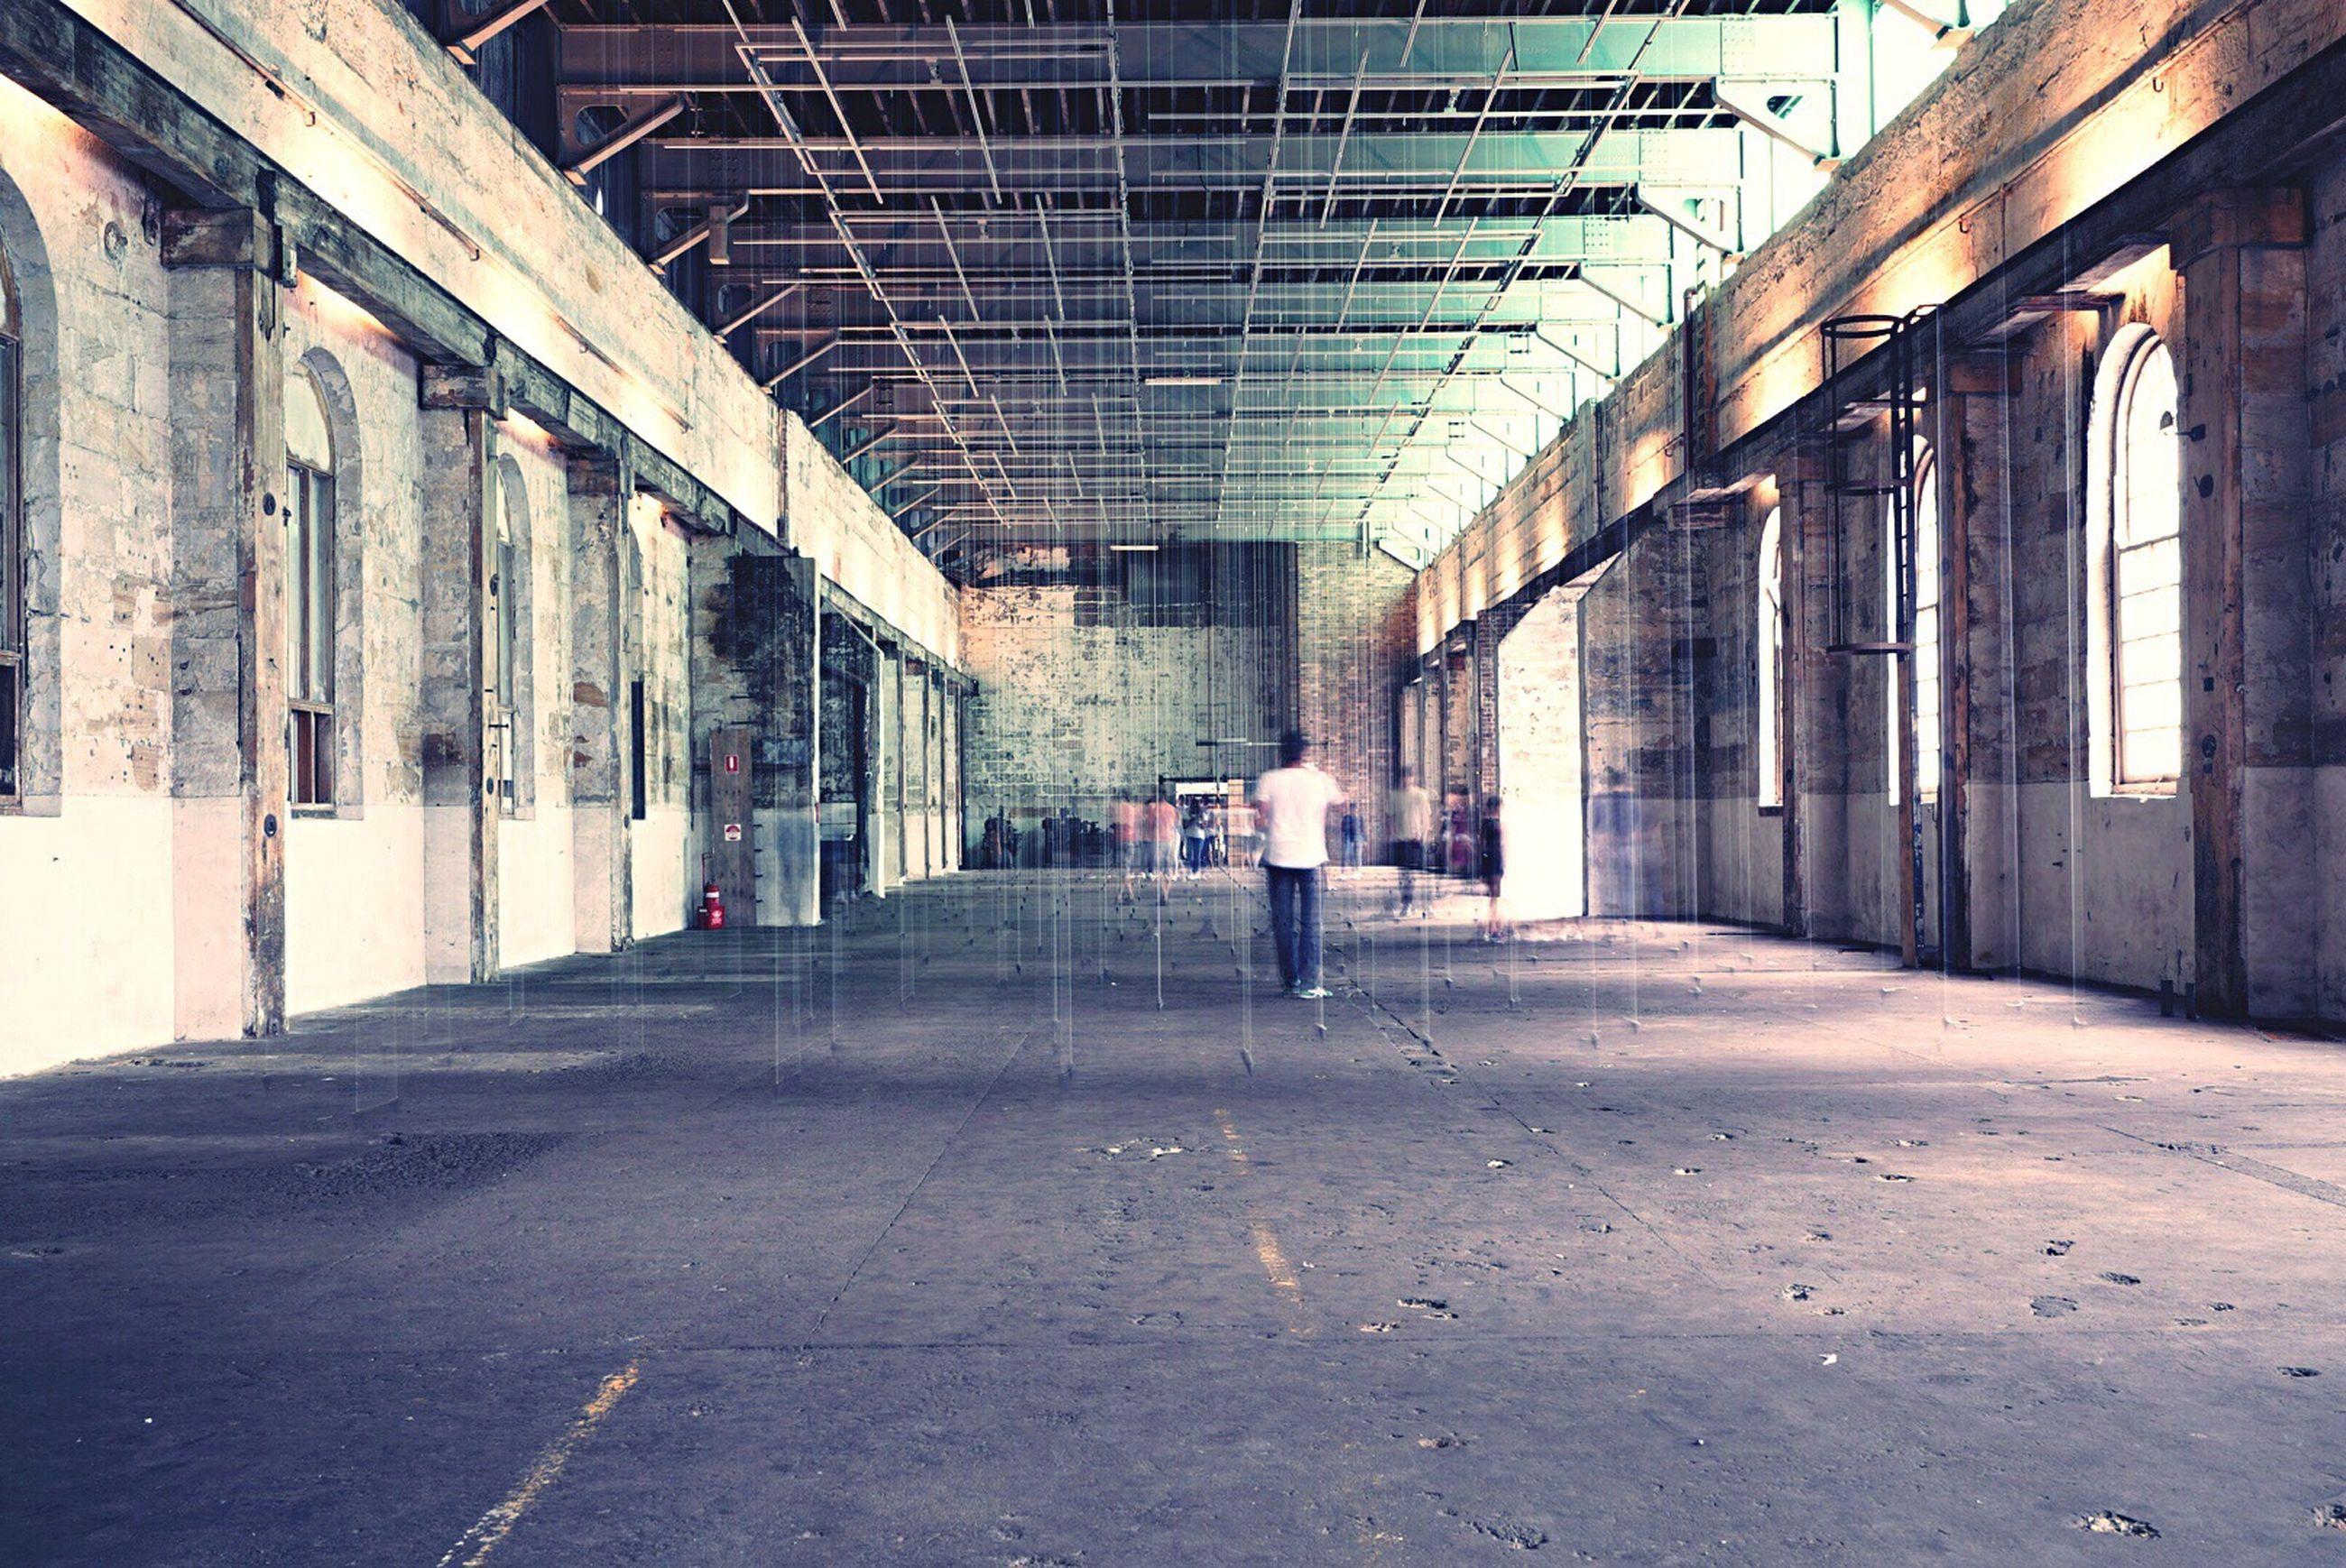 Rear view of man standing on floor in building